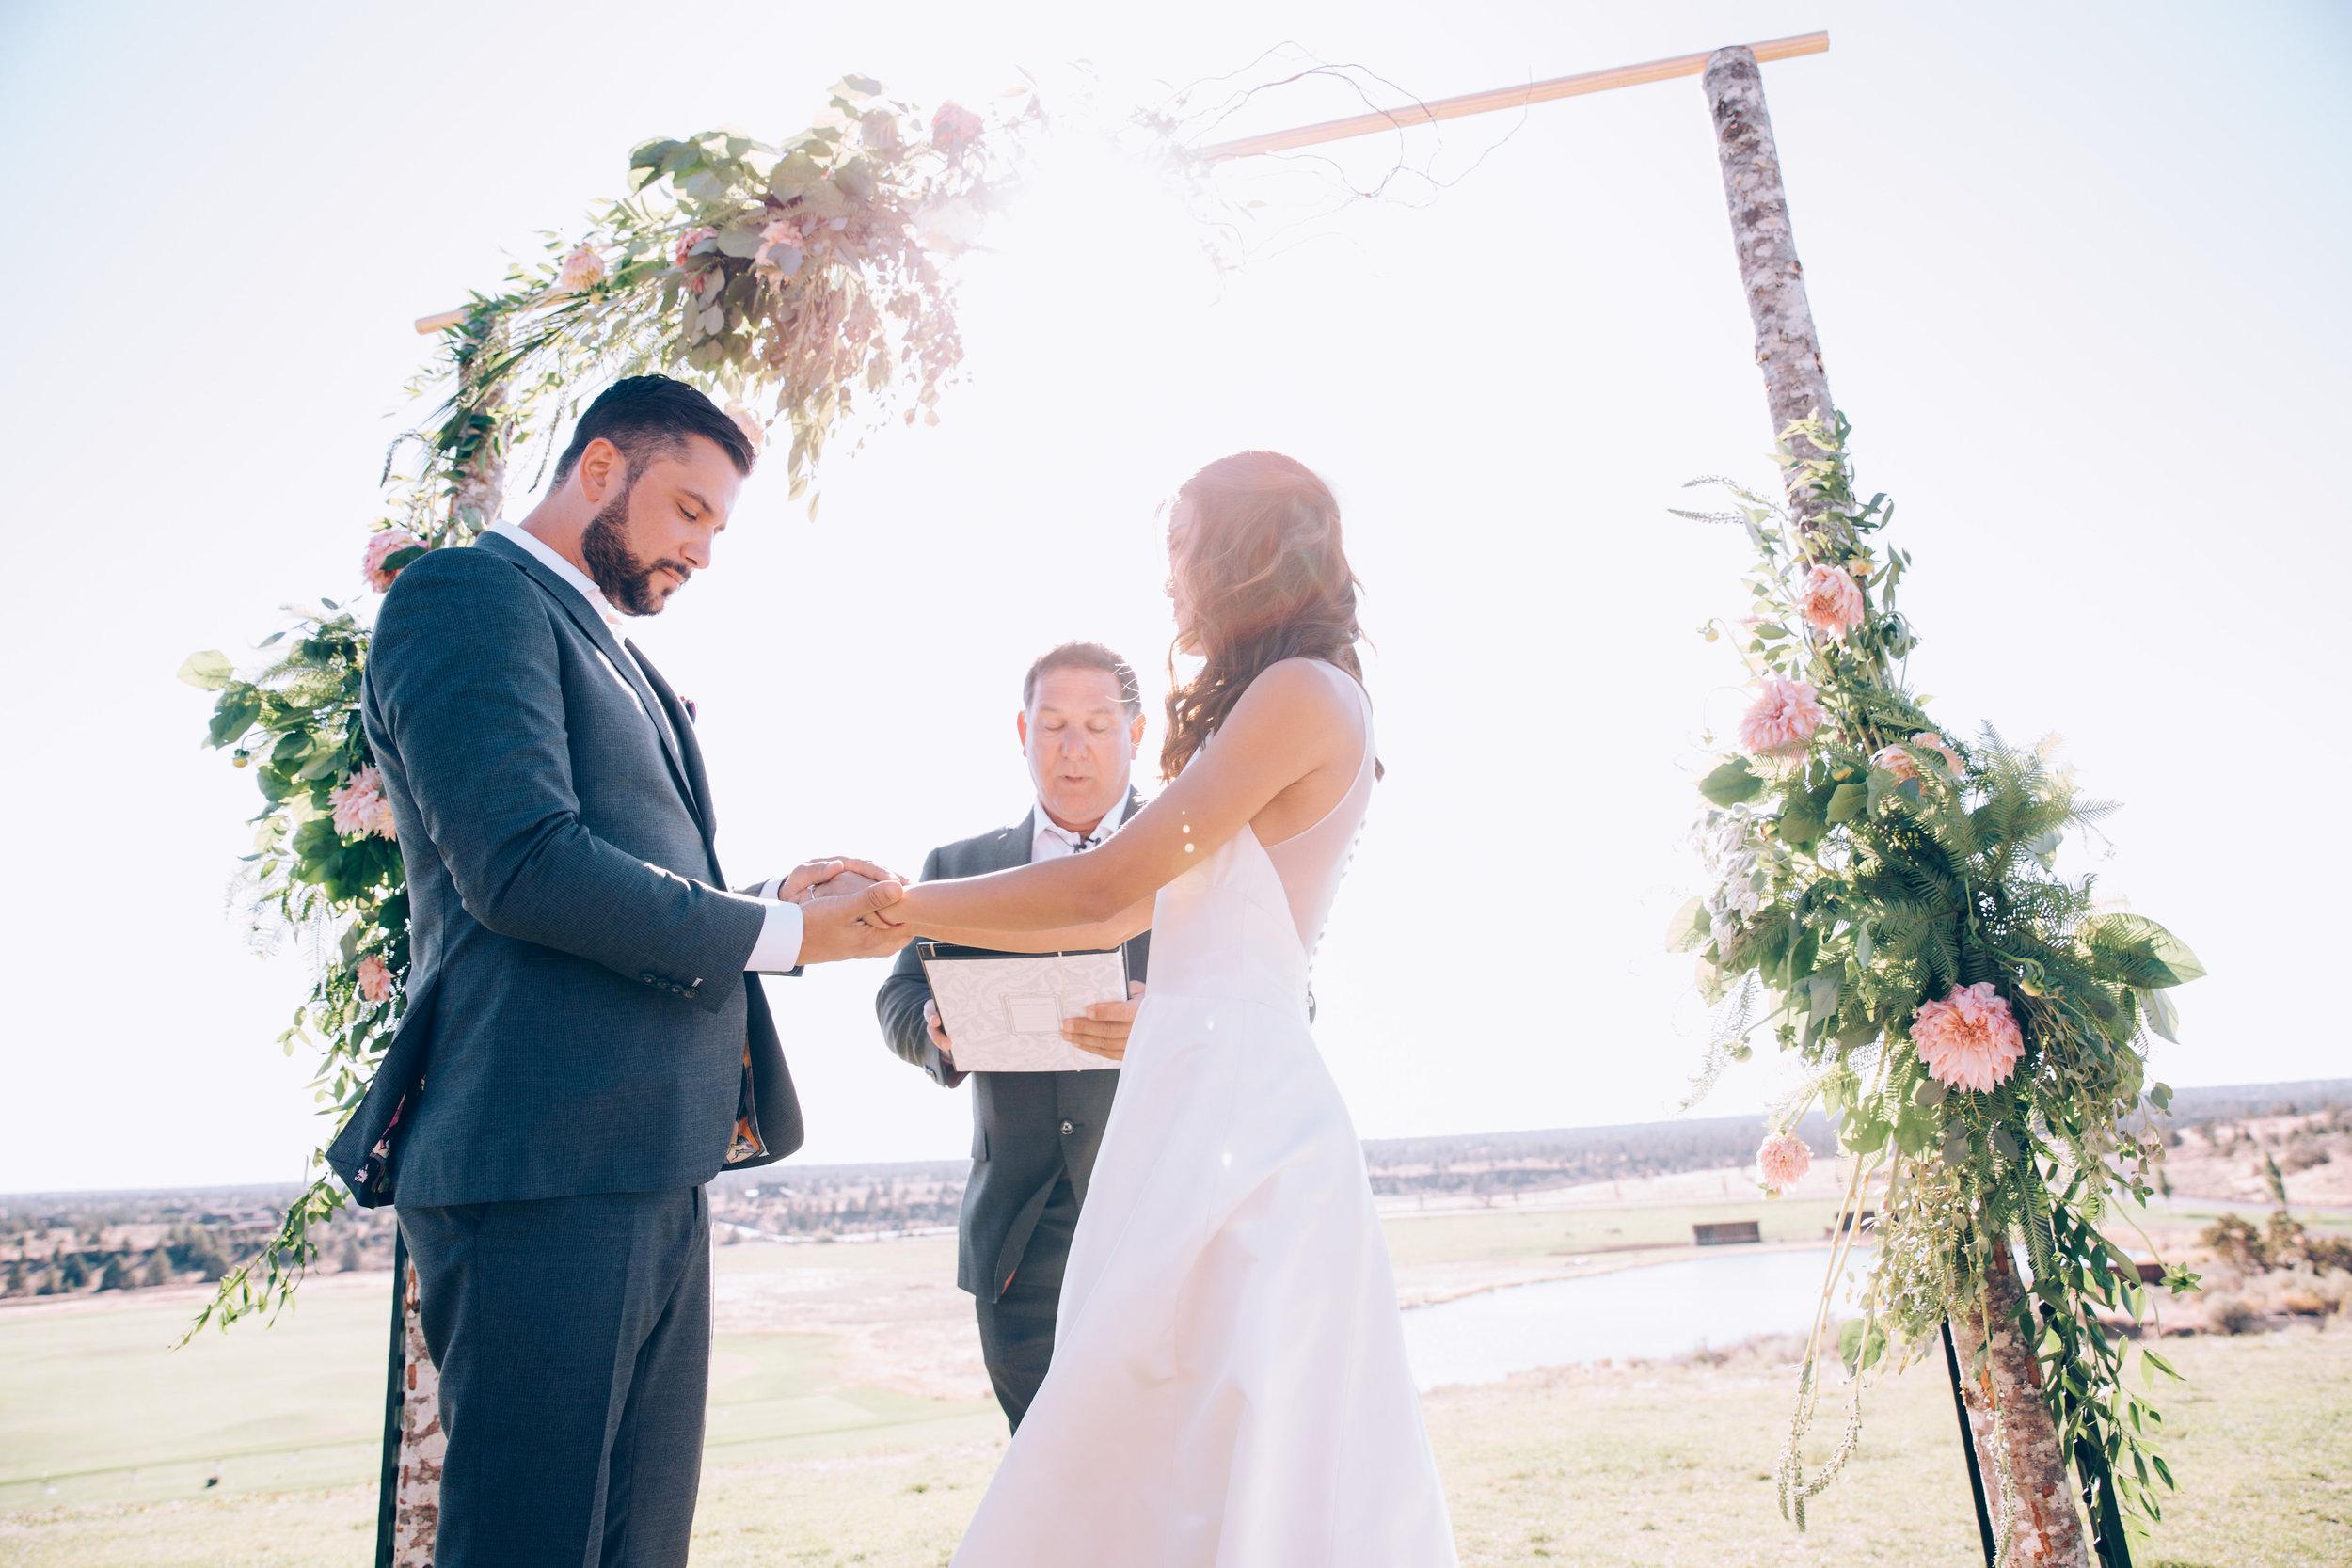 ©annajonesphotography_lisaqin_scottnewman_wedding_277.jpg